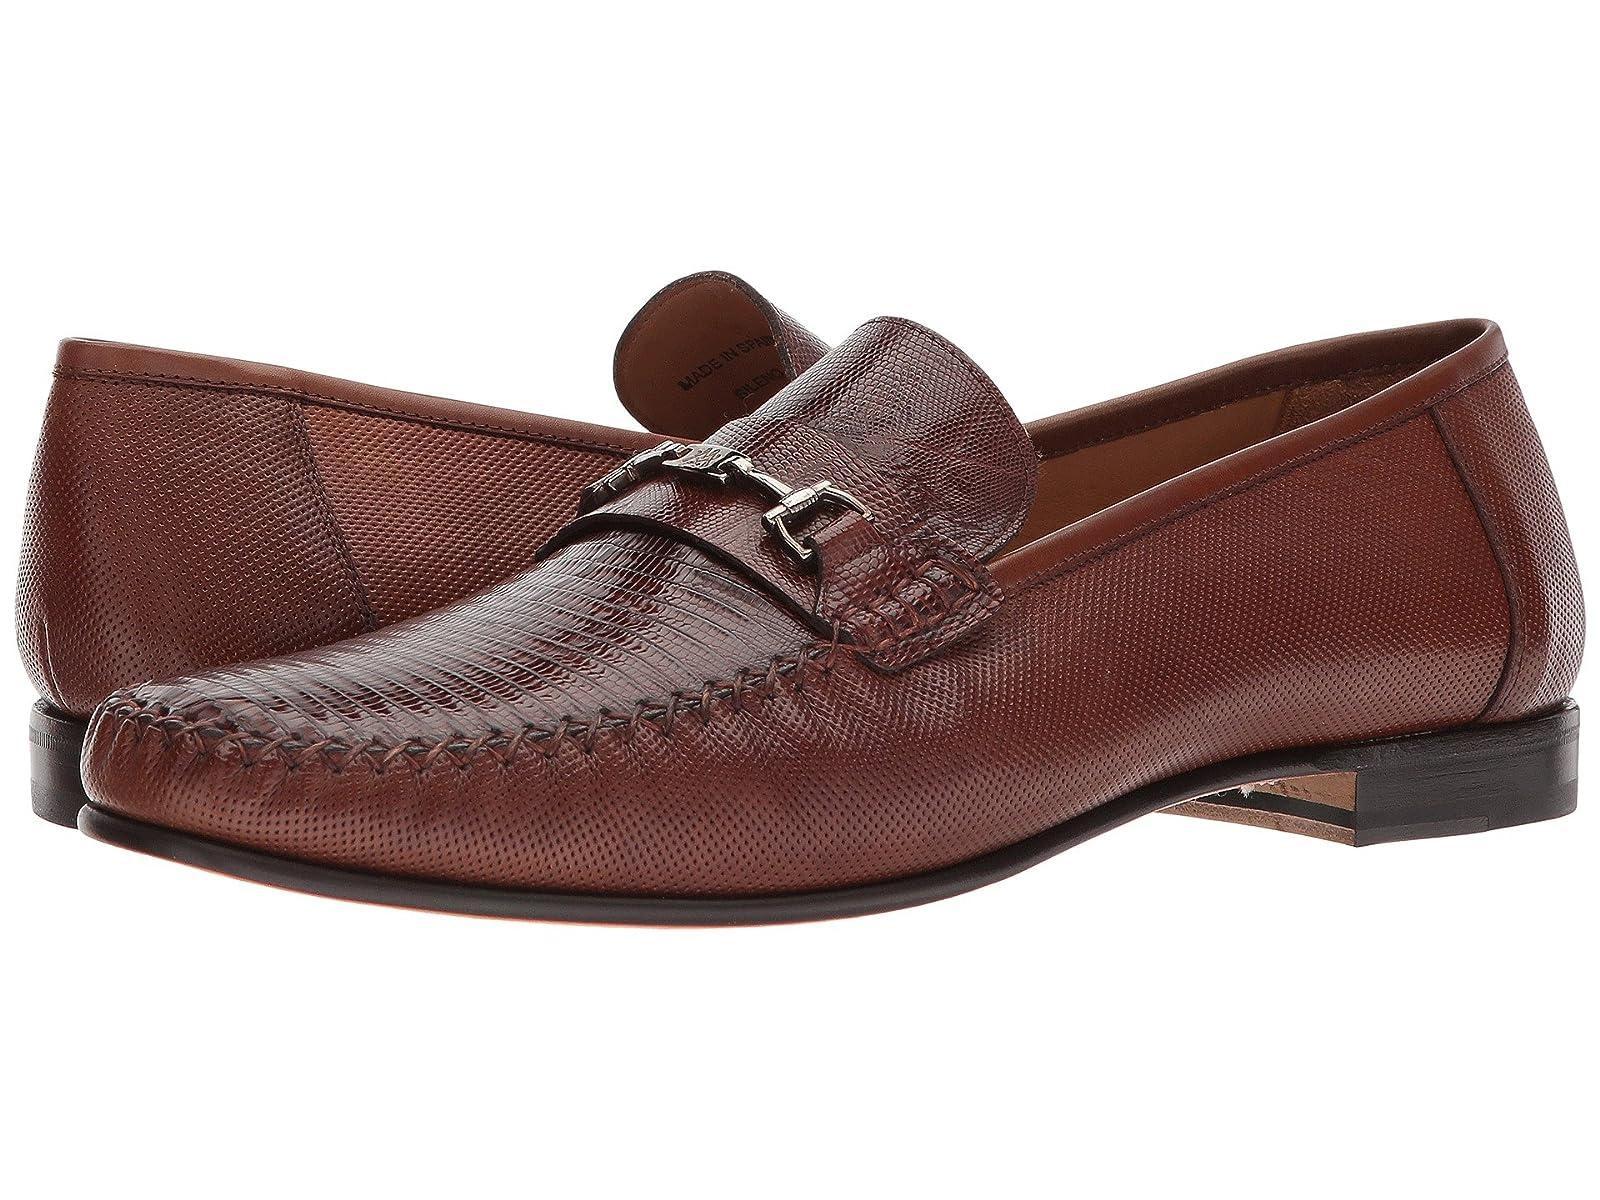 Mezlan SilenoAtmospheric grades have affordable shoes